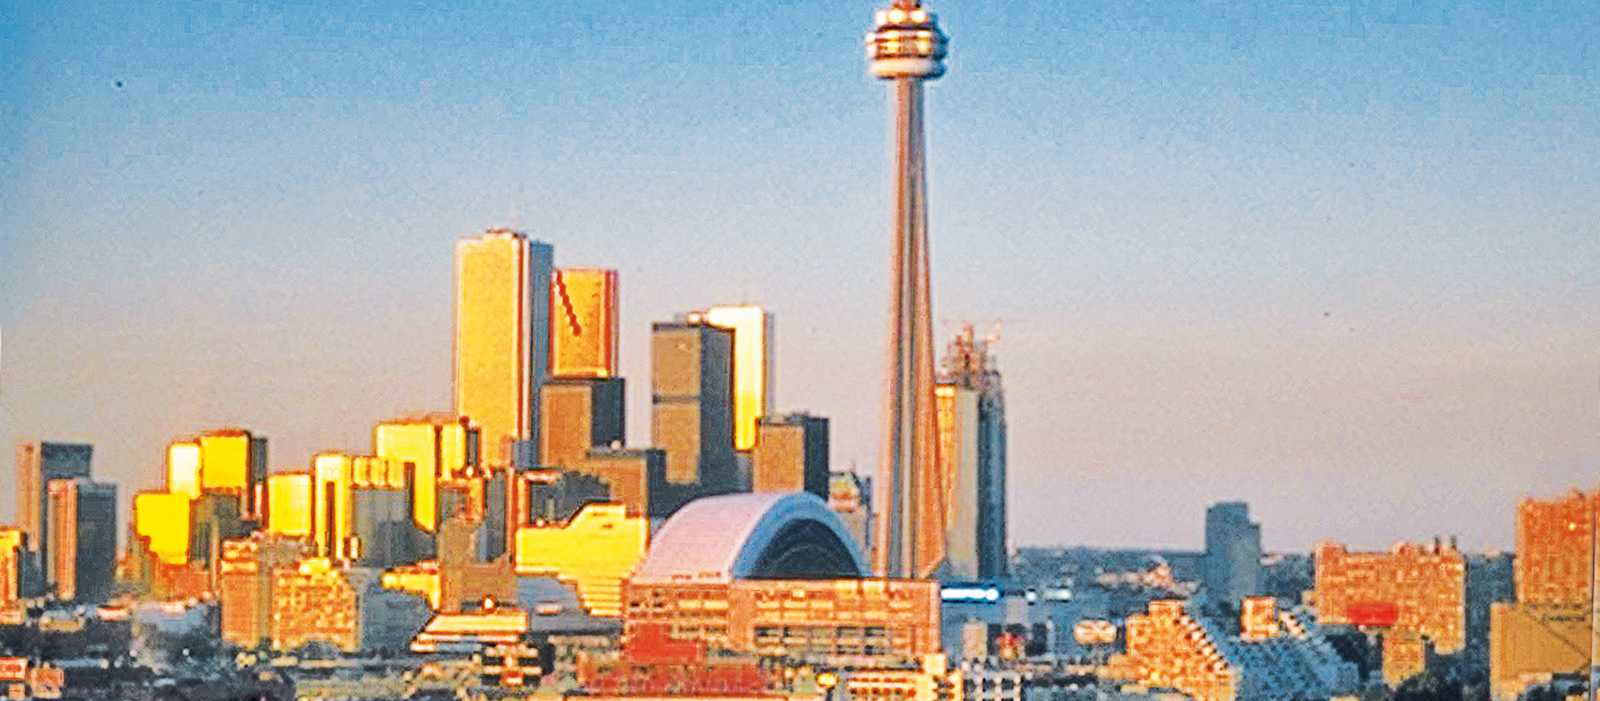 Toronto mit CN Tower